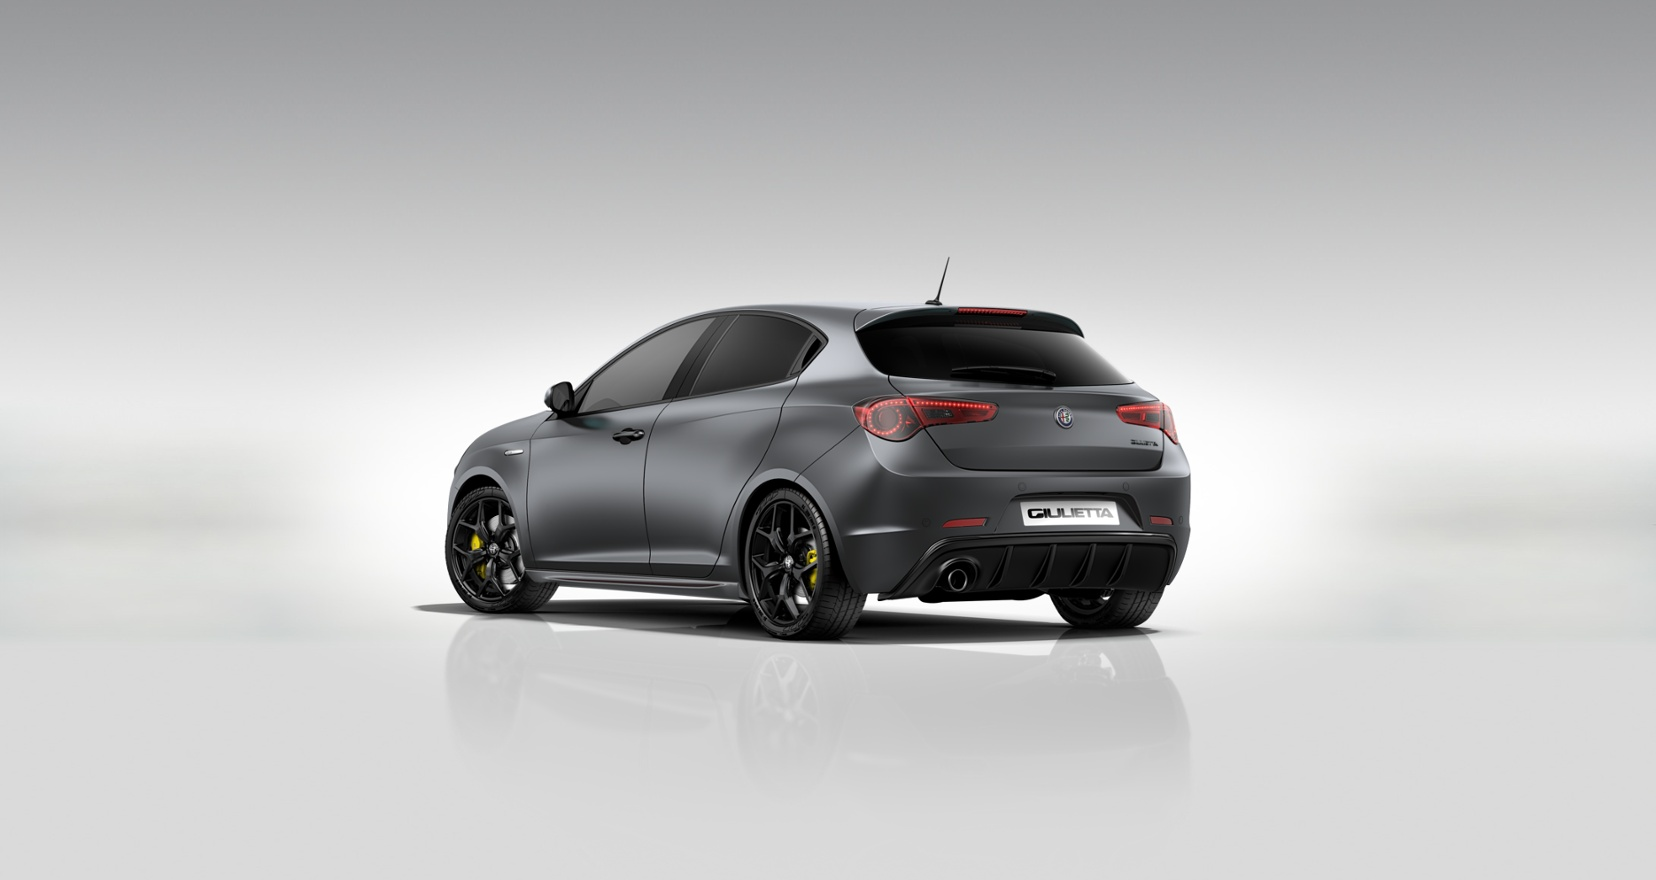 Alfa Romeo Giulietta Sprint Matgrijs - Schuin achteraanzicht